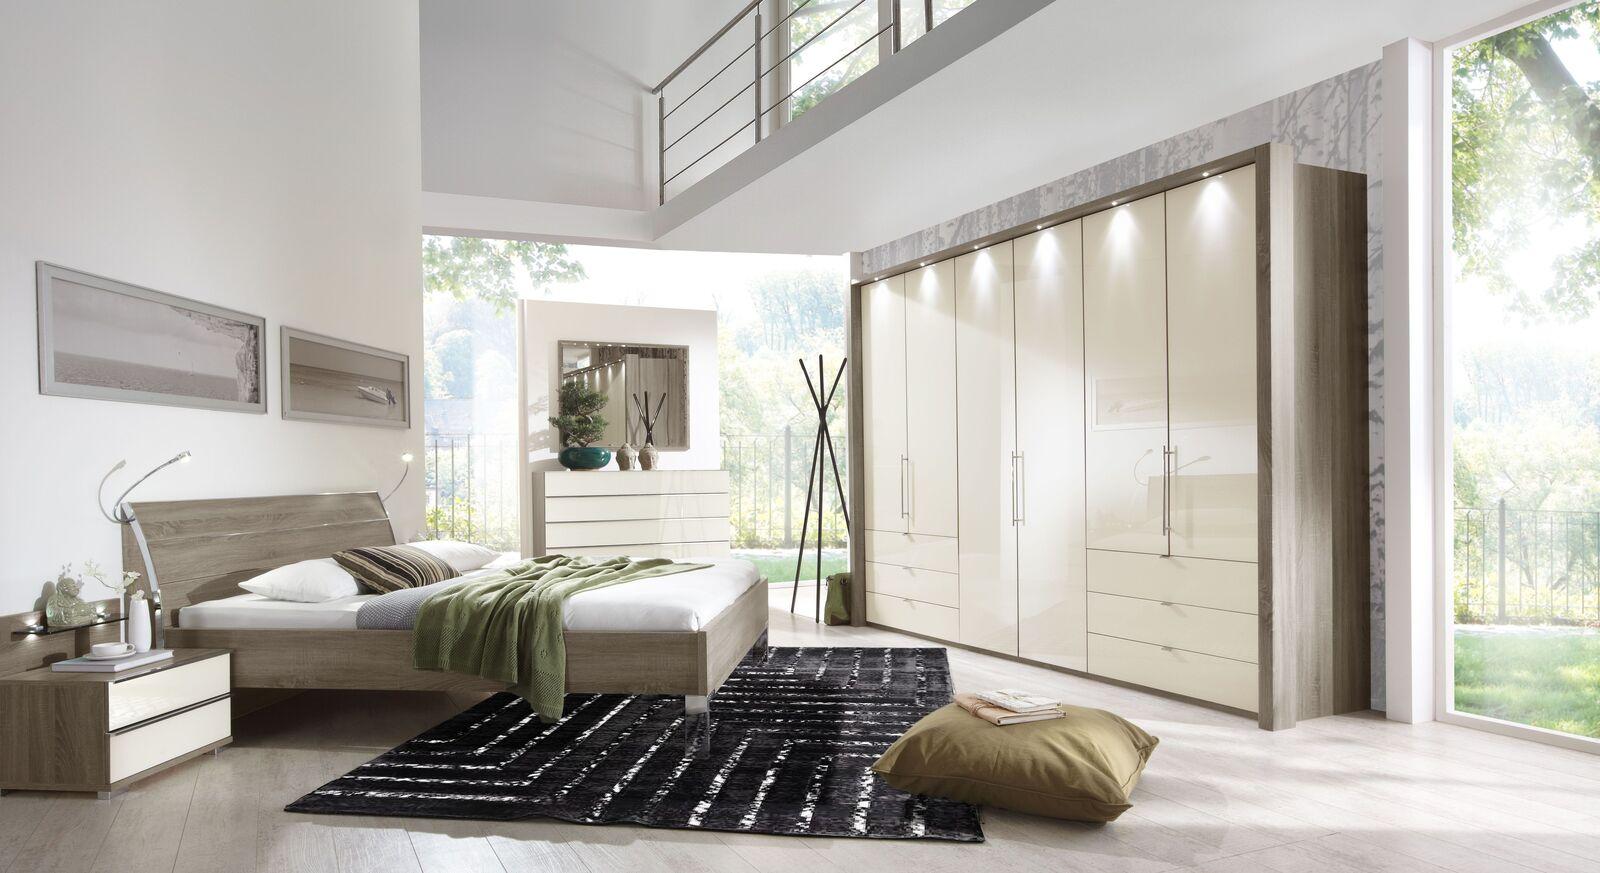 angebot schlafzimmer komplett – abomaheber